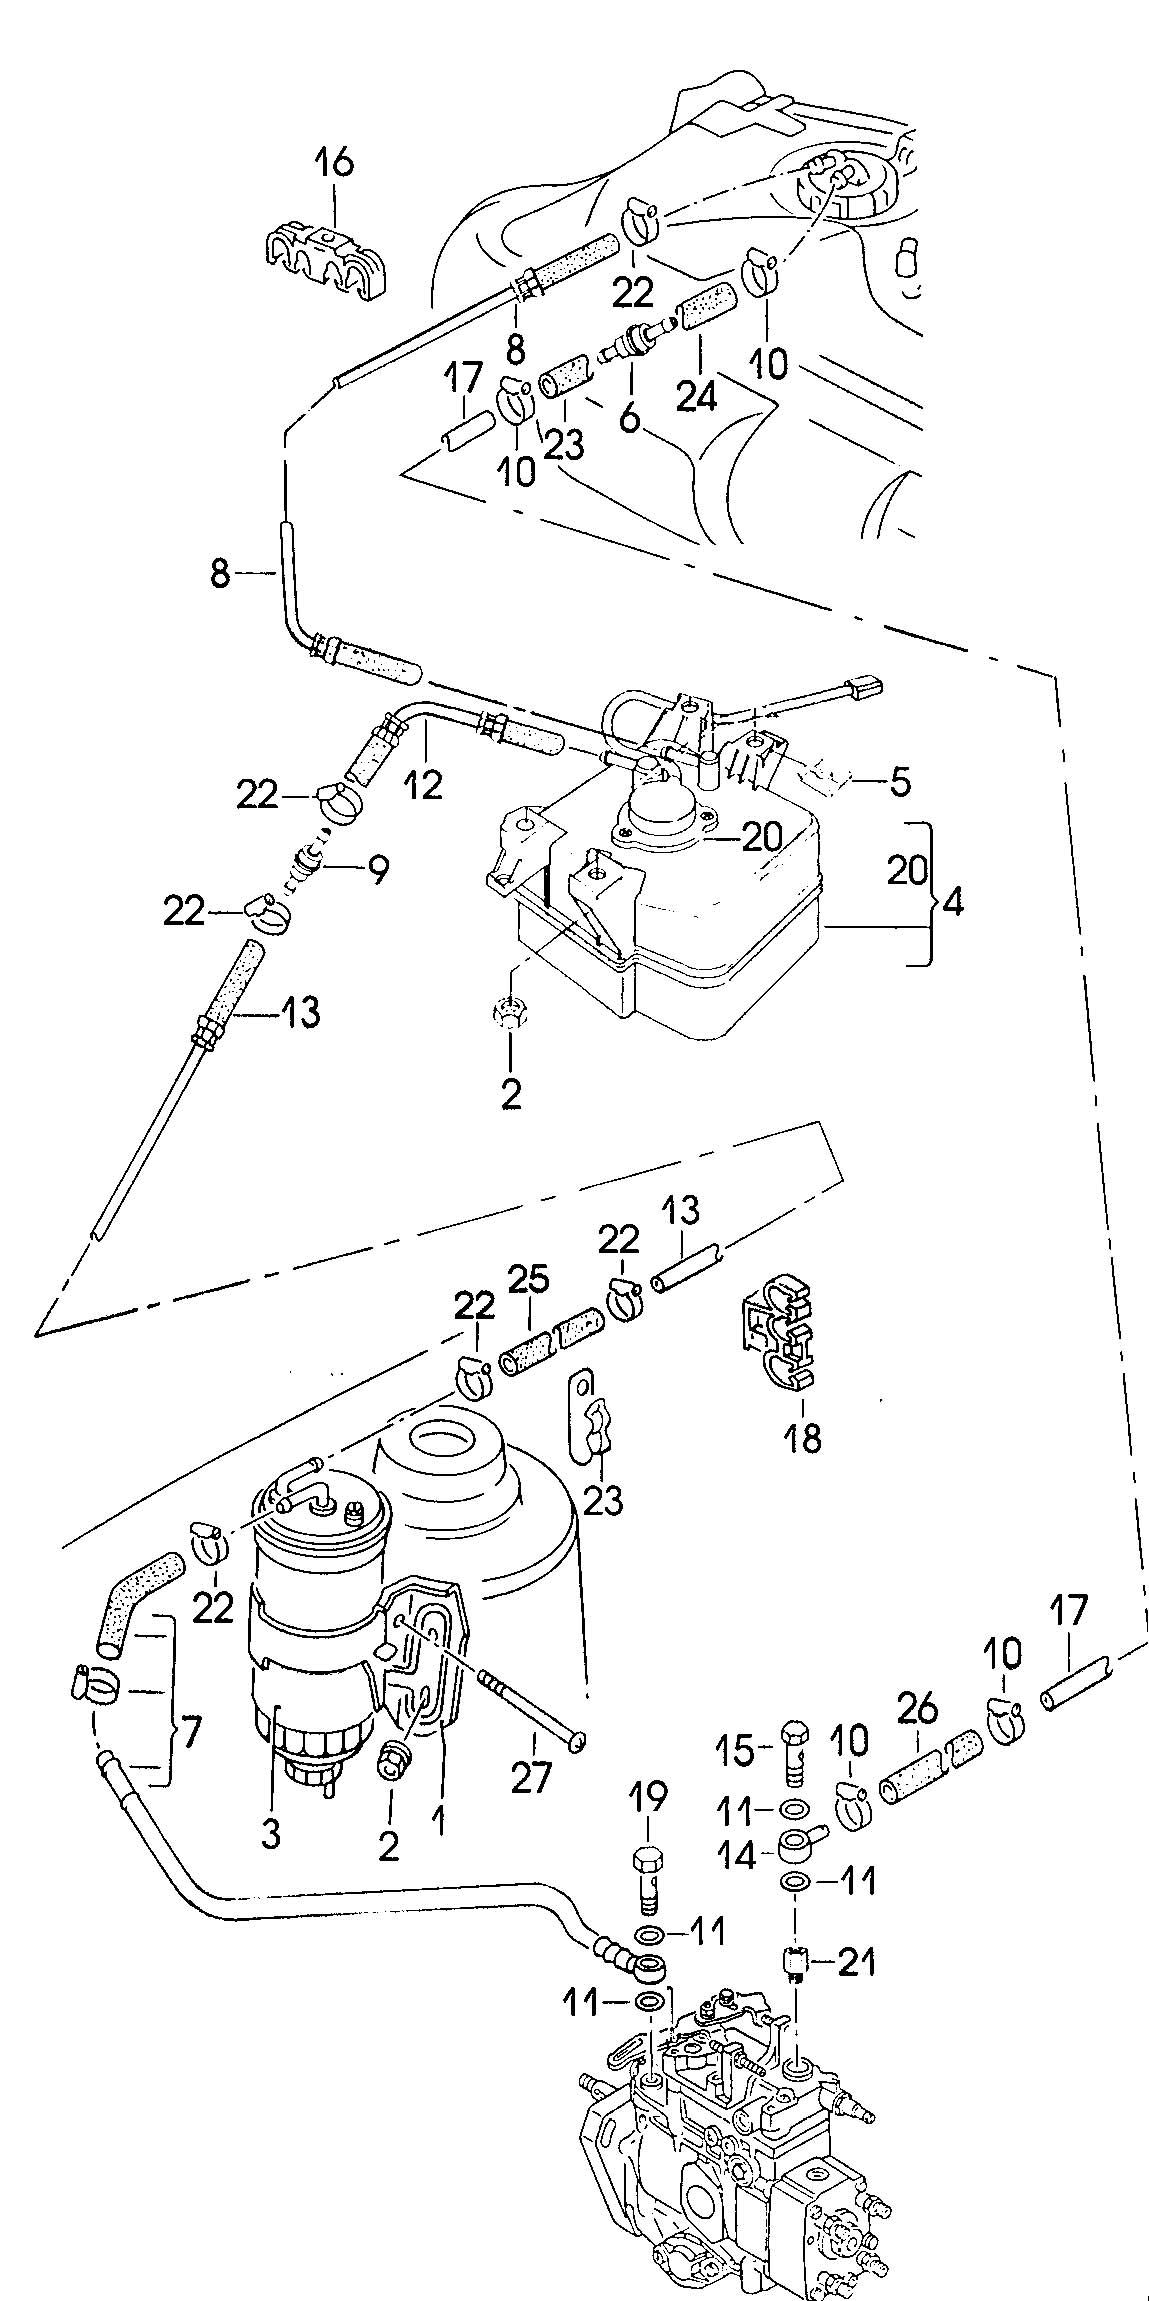 Volkswagen Jetta Water Trap Fuel Filter Fuel Line